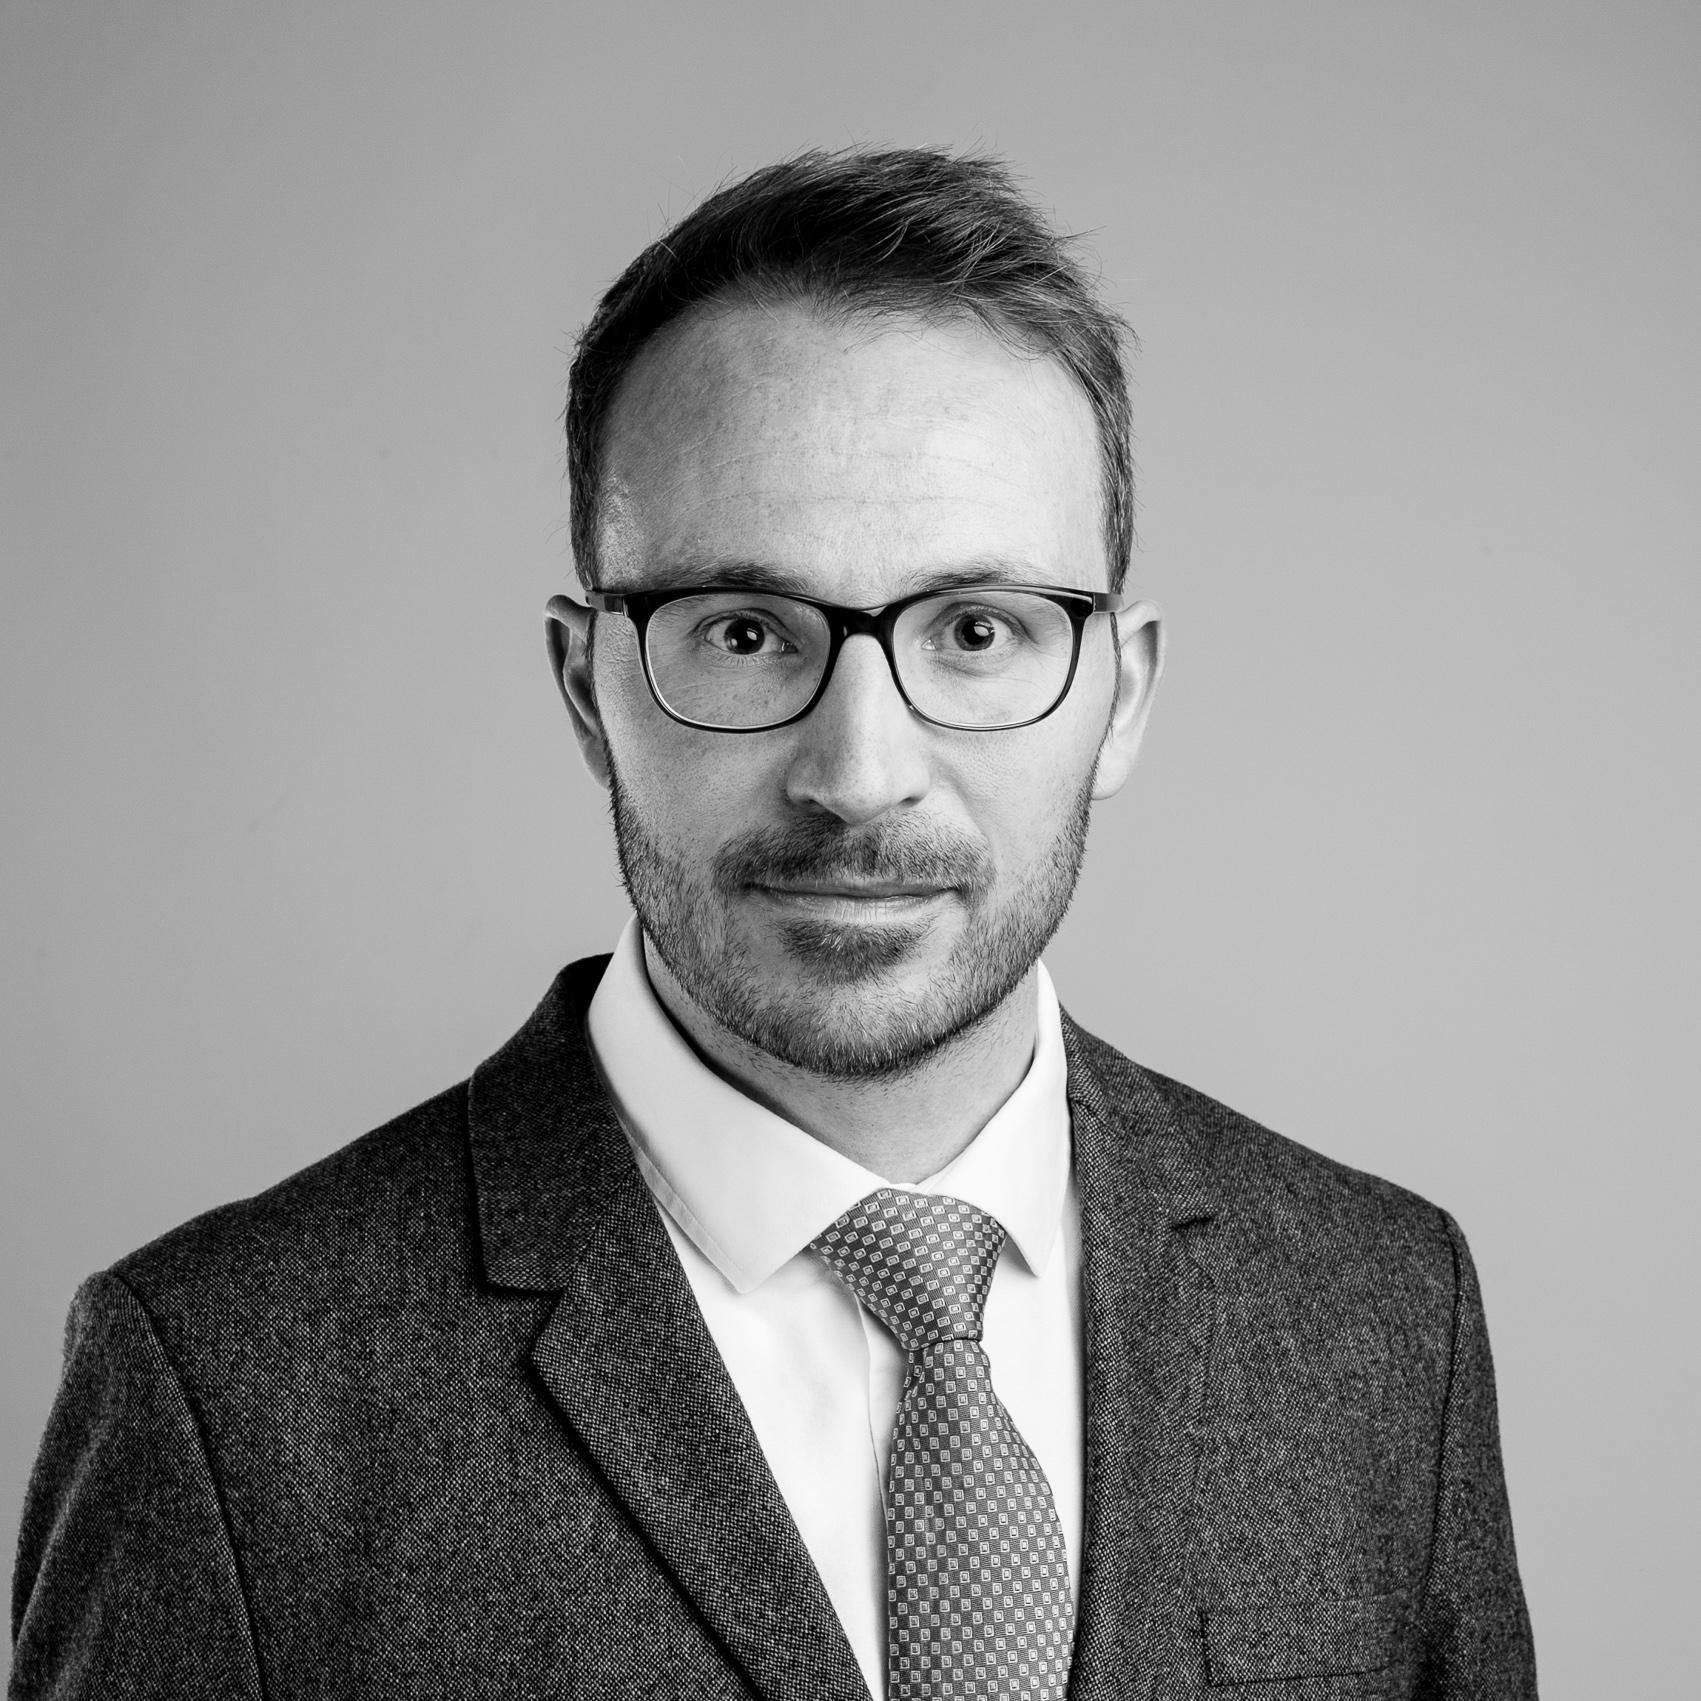 advok-portrait-006.jpg